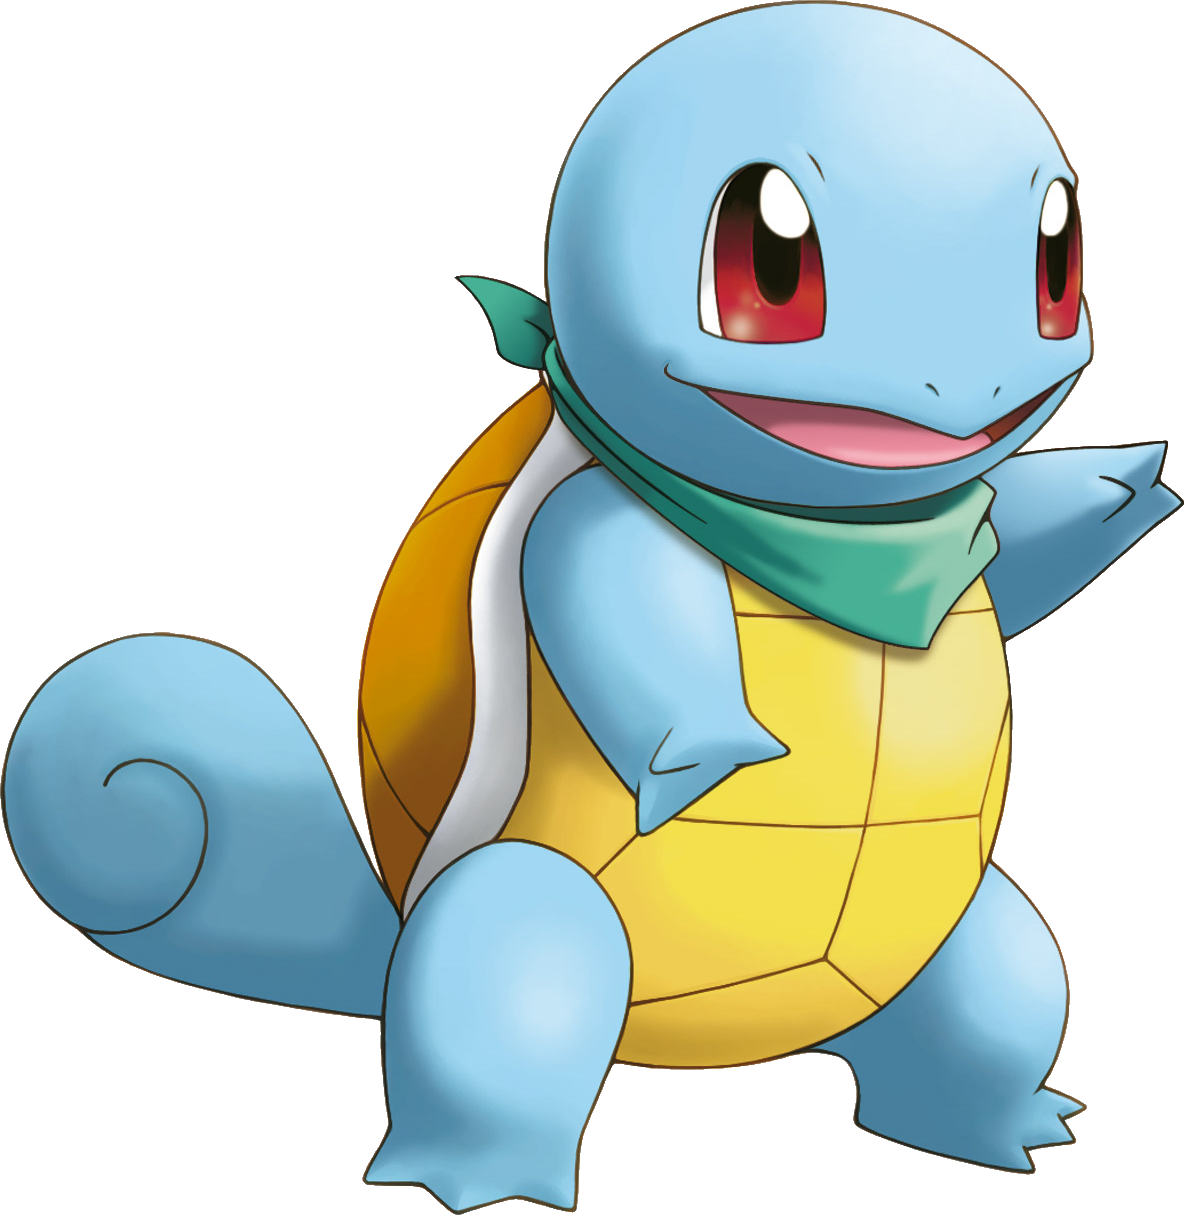 Pokemon Png PNG Image - Pokemon PNG